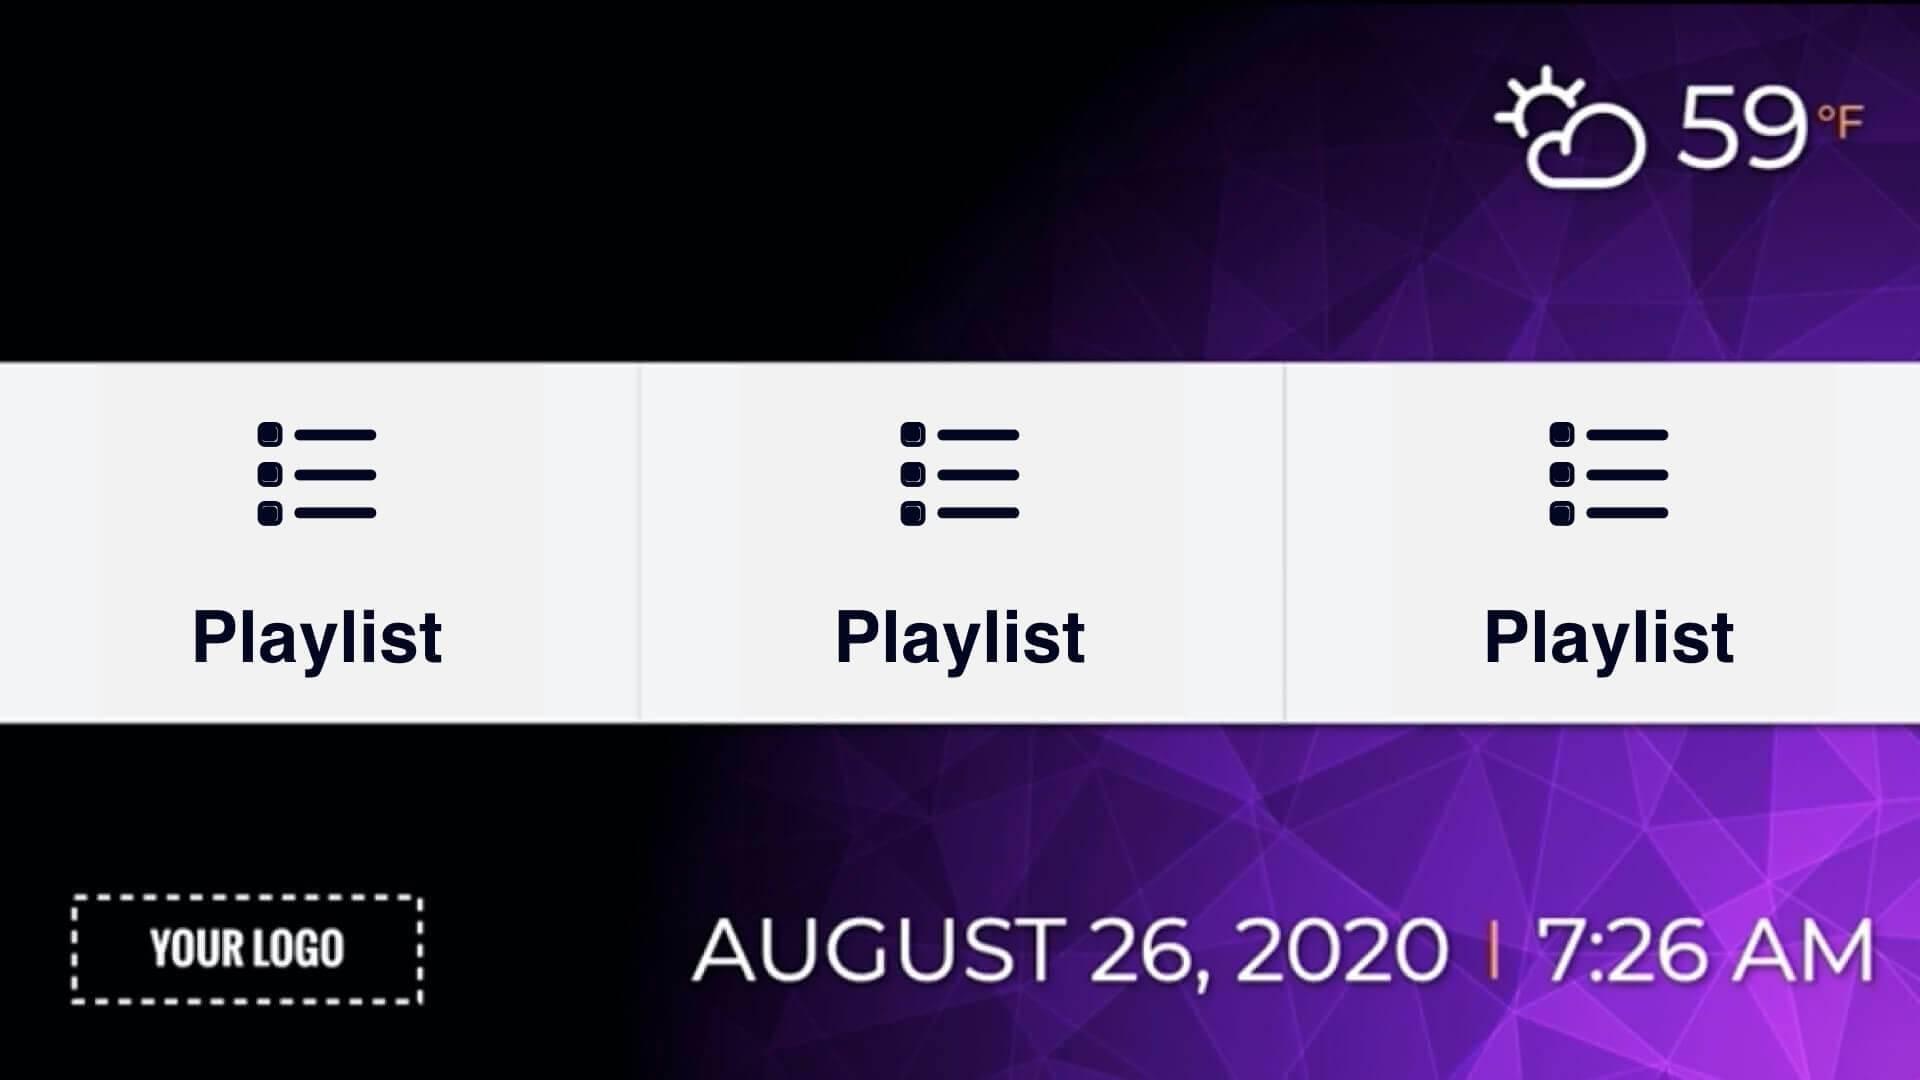 Zoned Playlist 3x1 Presentation Digital Signage Template